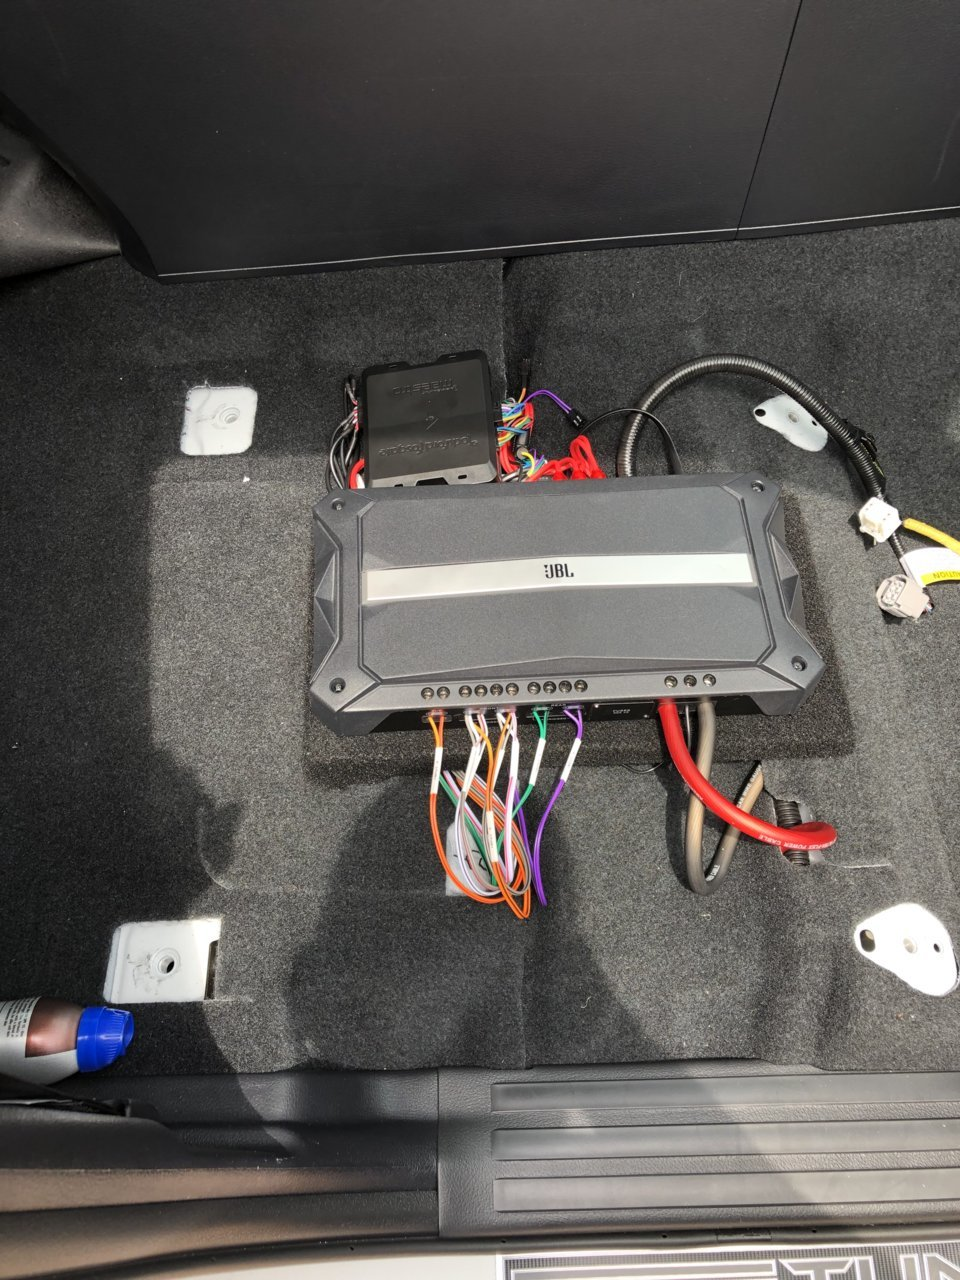 JBL upgrade | Toyota Tundra Forum on mercury marine wire harness, marine starter wiring, marine wiring accessories,